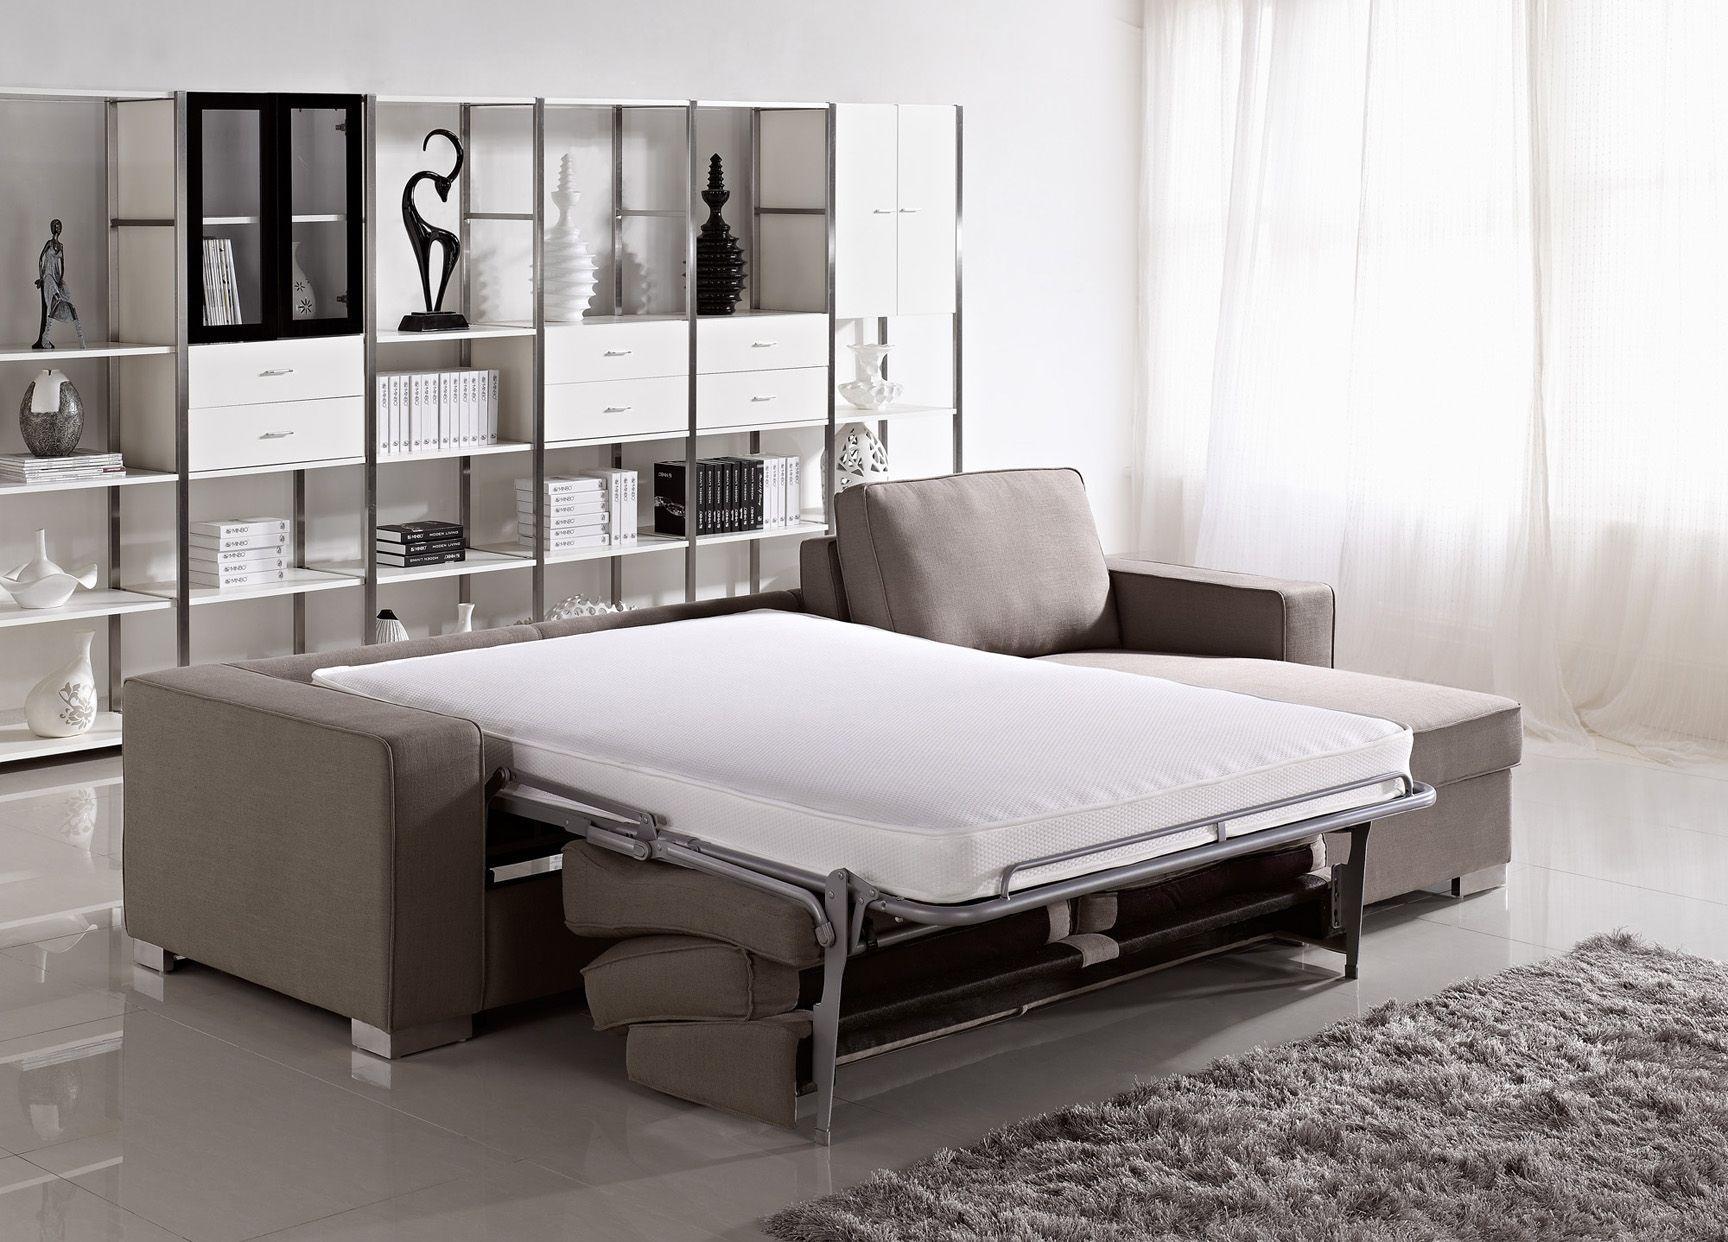 Apartment Sized Sofa For Condo Size Sofas (Image 4 of 20)